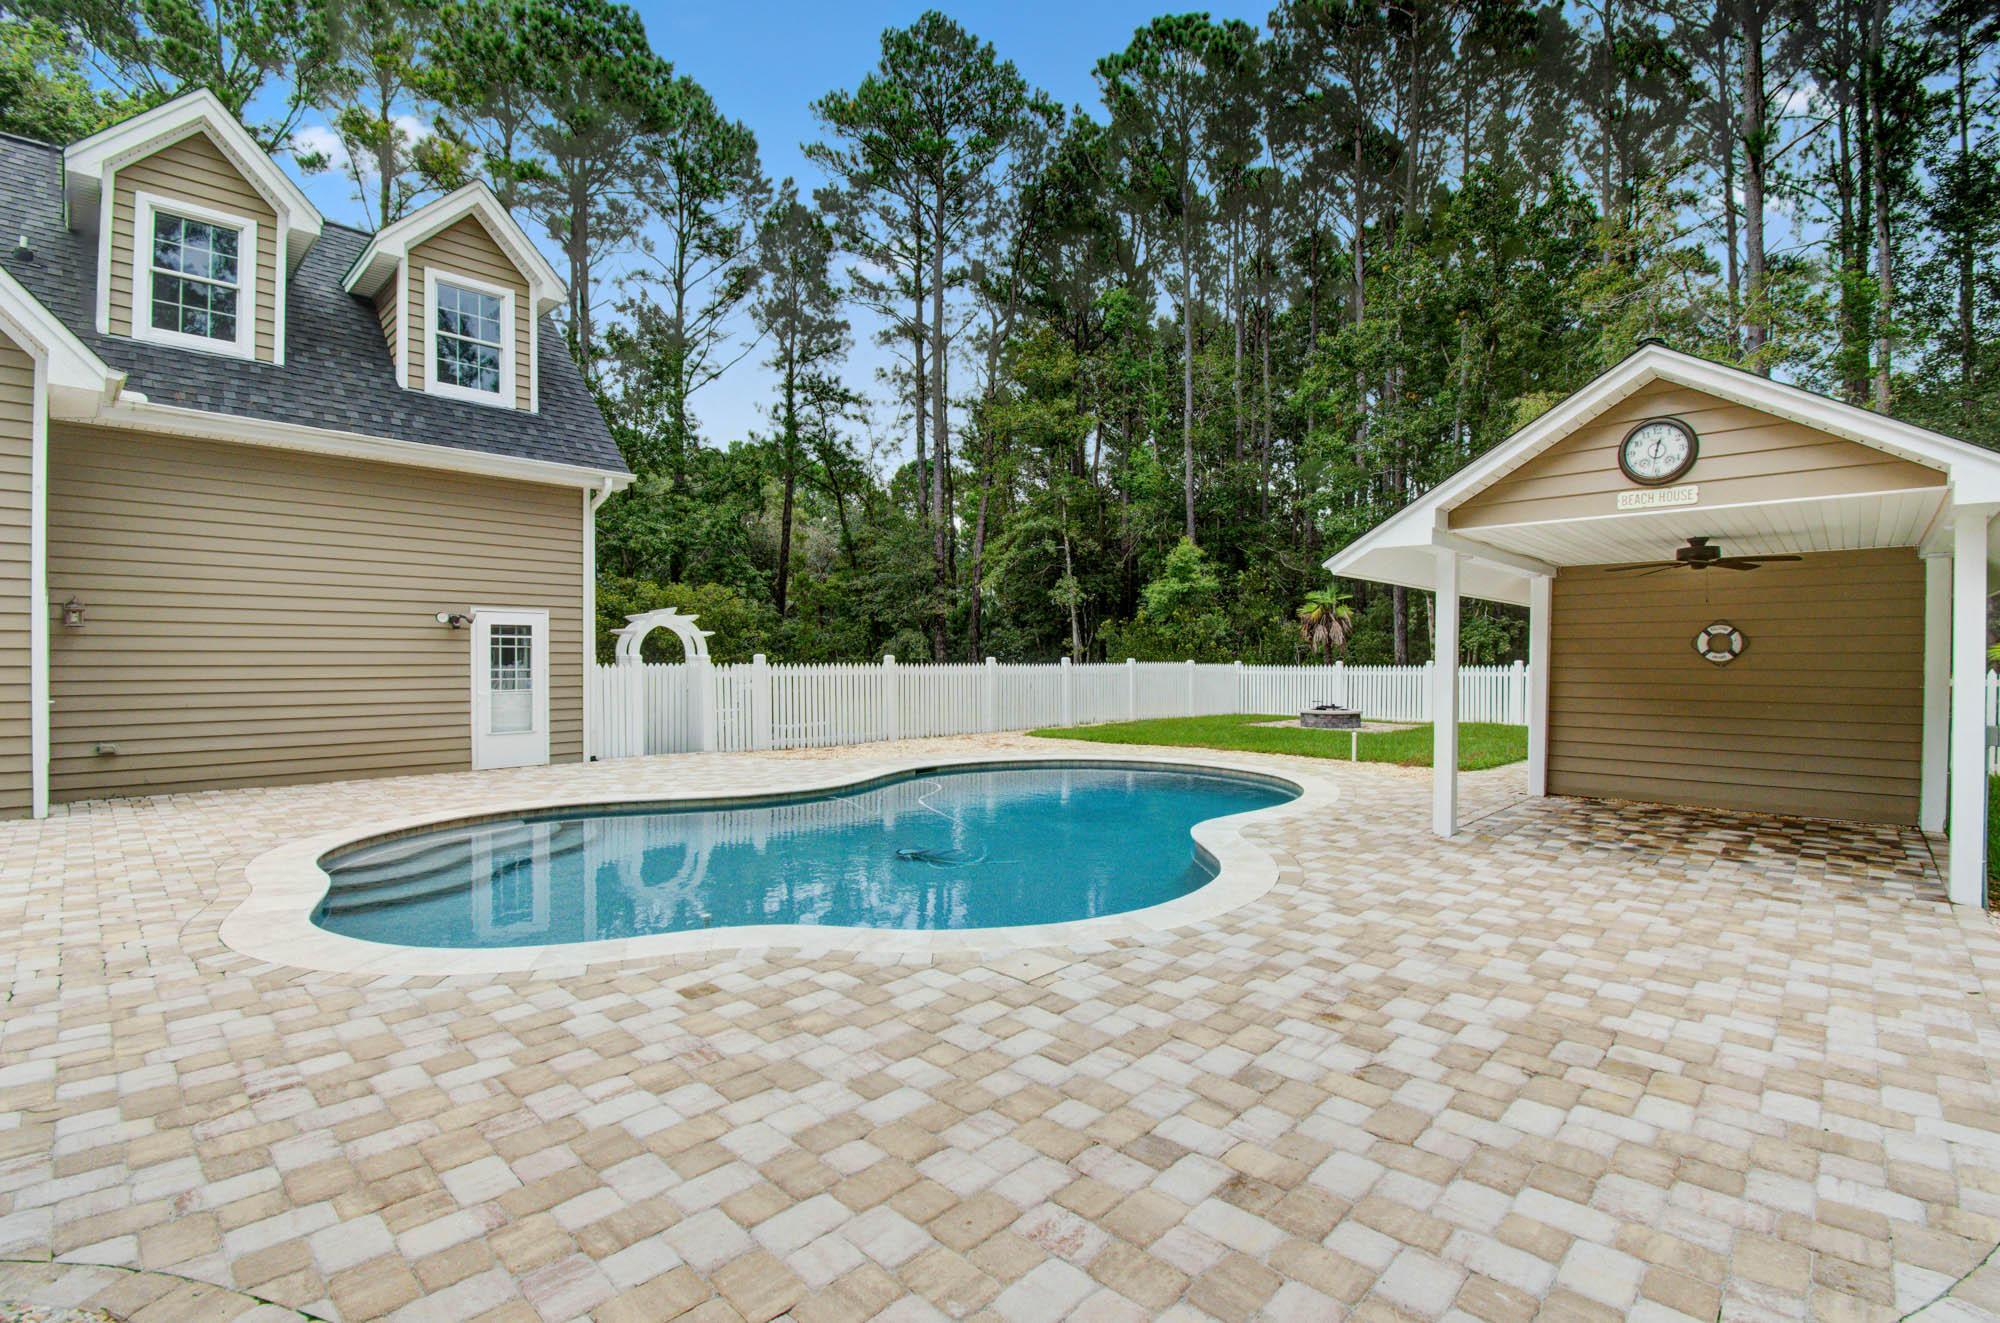 Dunes West Homes For Sale - 3515 Colonel Vanderhorst, Mount Pleasant, SC - 22